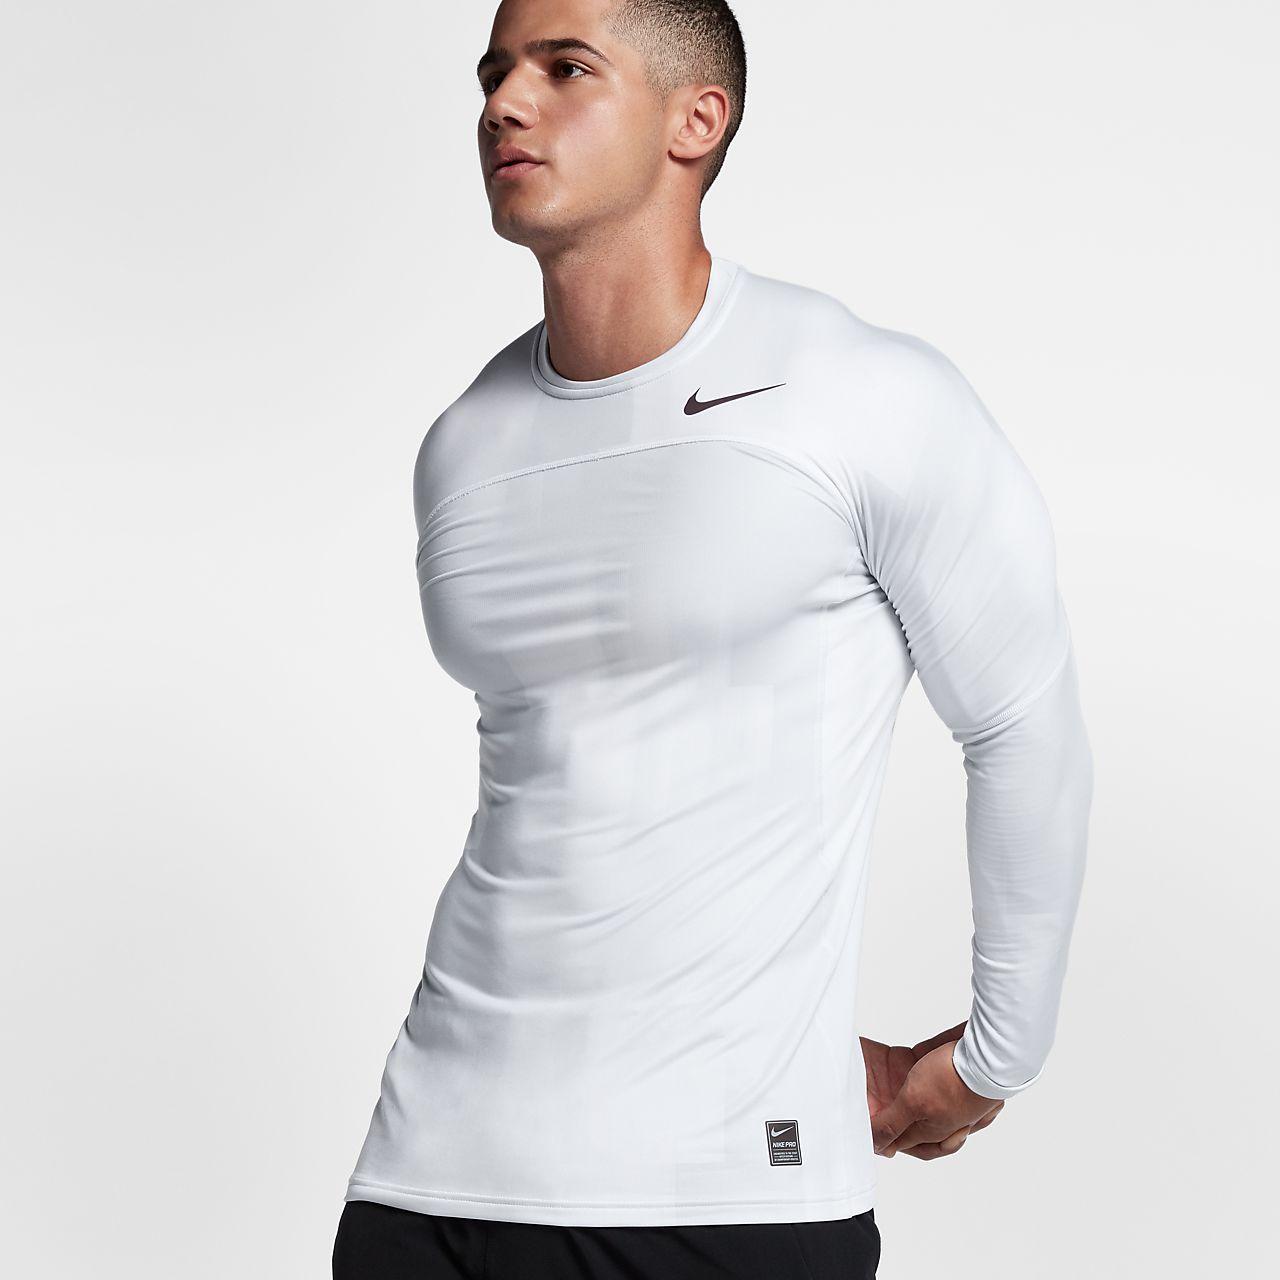 ... Nike Pro HyperWarm Men's Long Sleeve Training Top